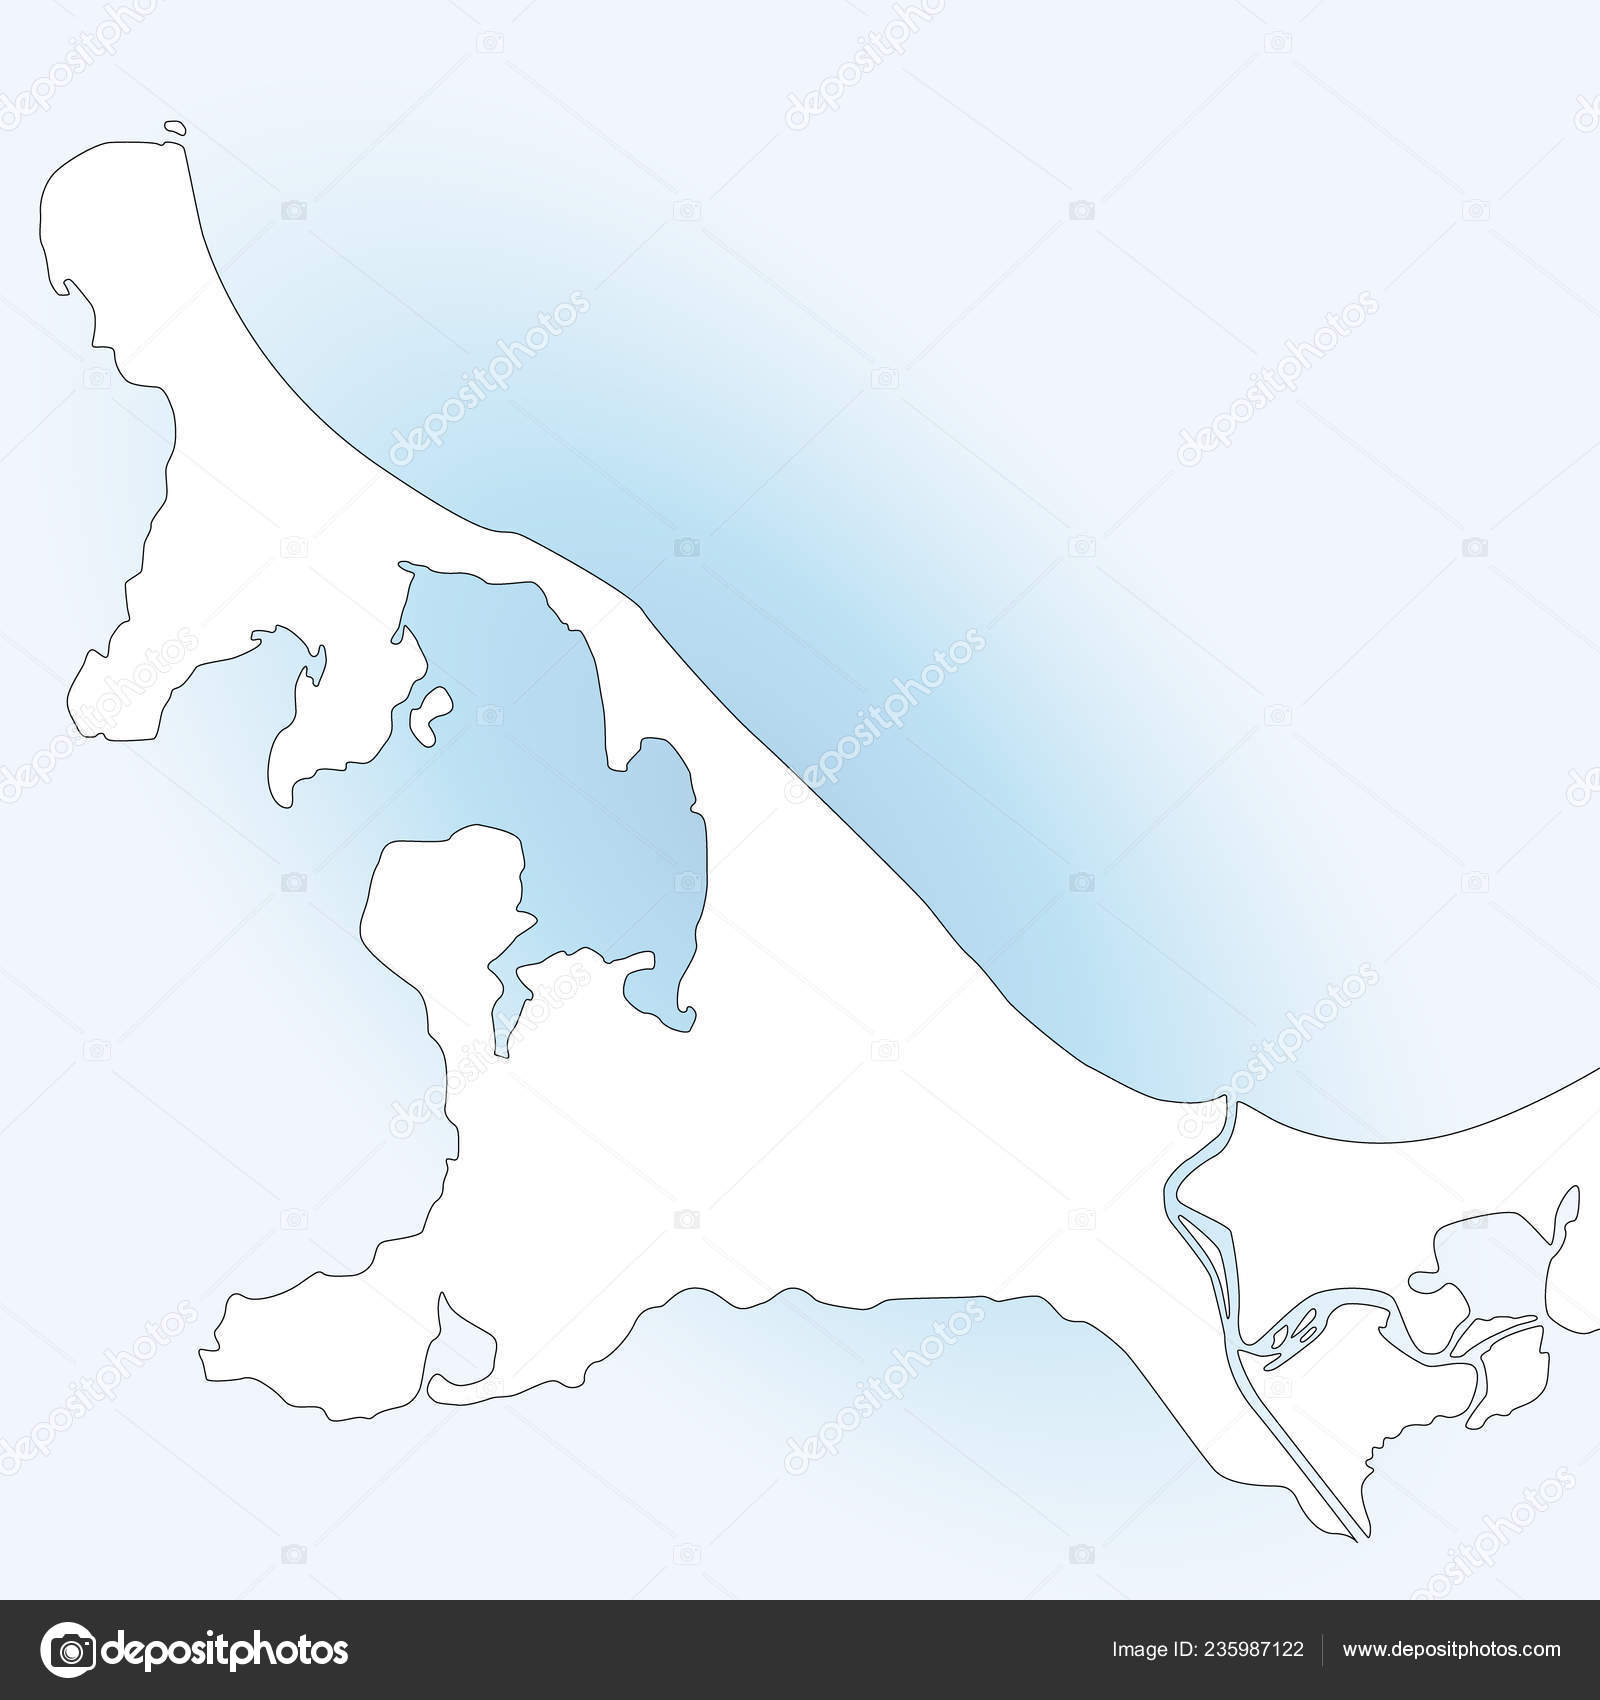 Usedom Karte Grenze.Deutschland Karte Der Insel Usedom Stockvektor Ii Graphics